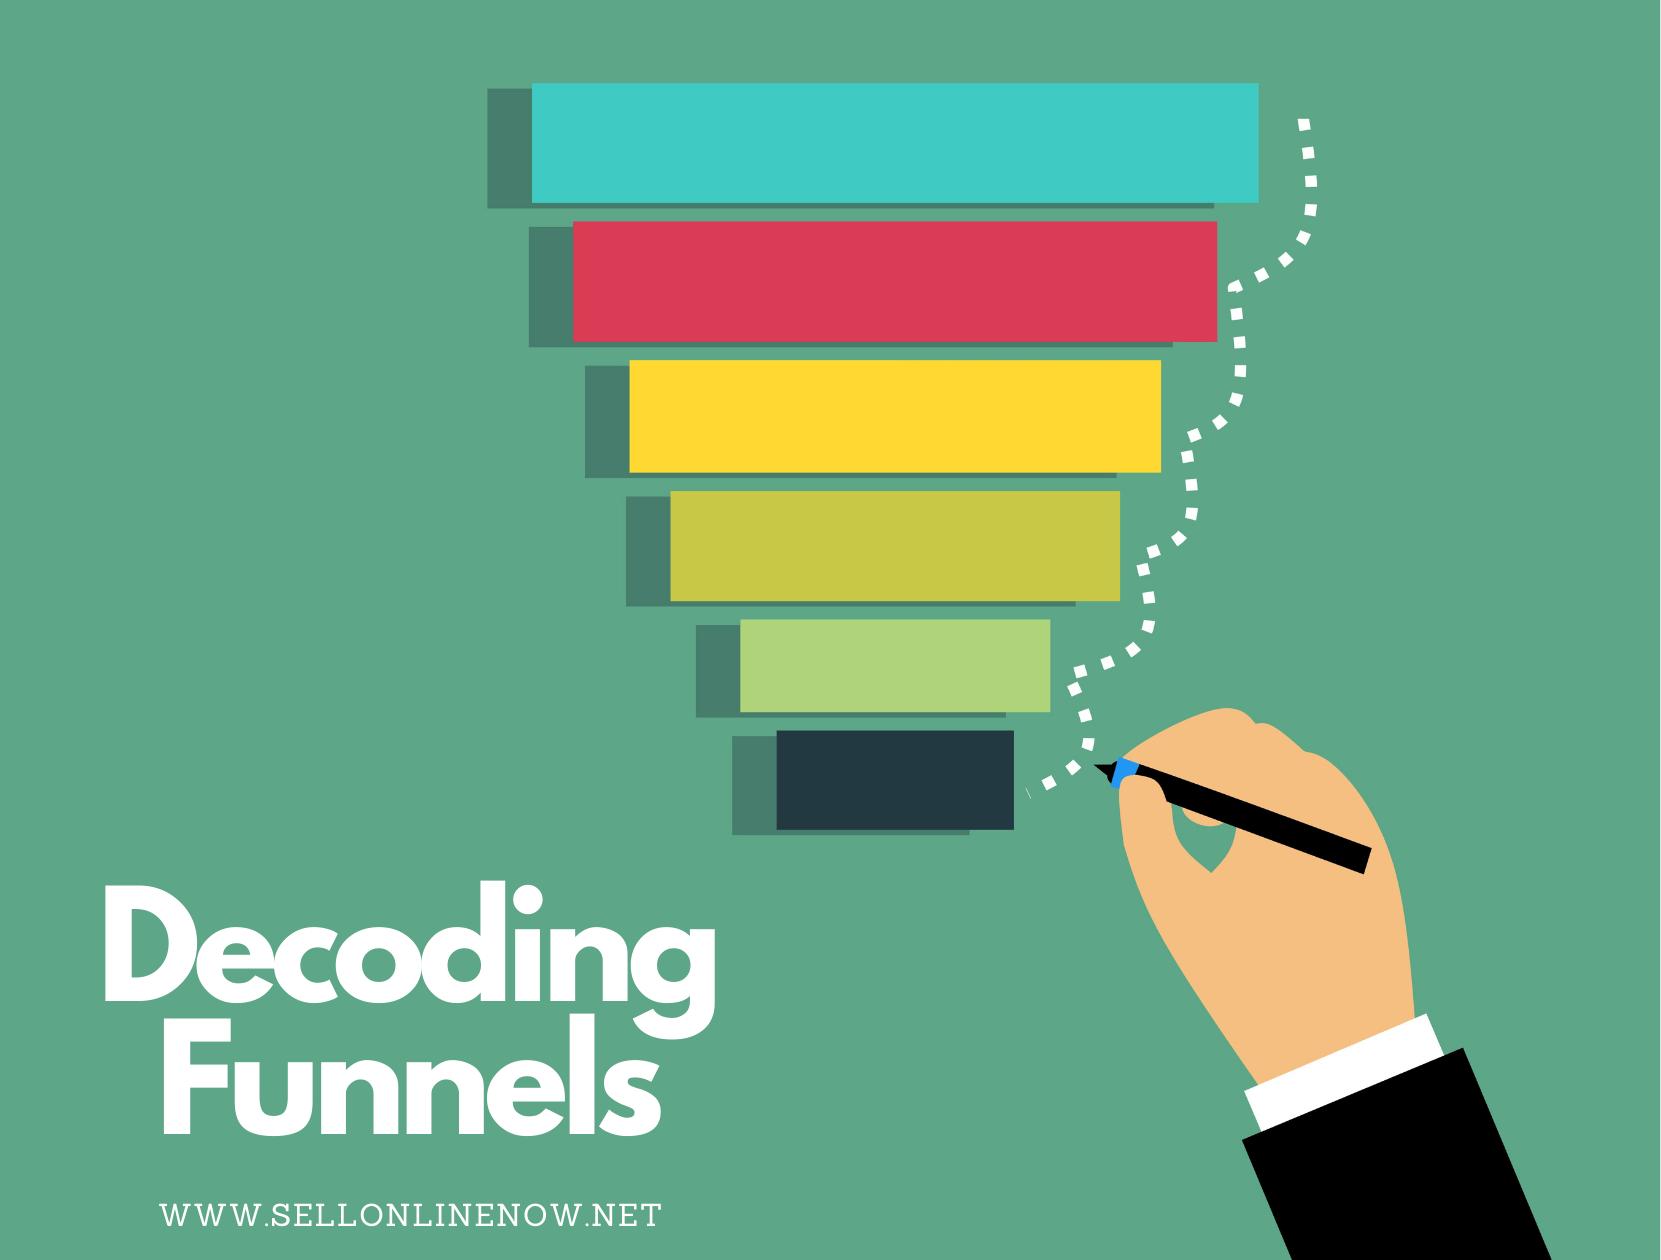 Decoding Funnels